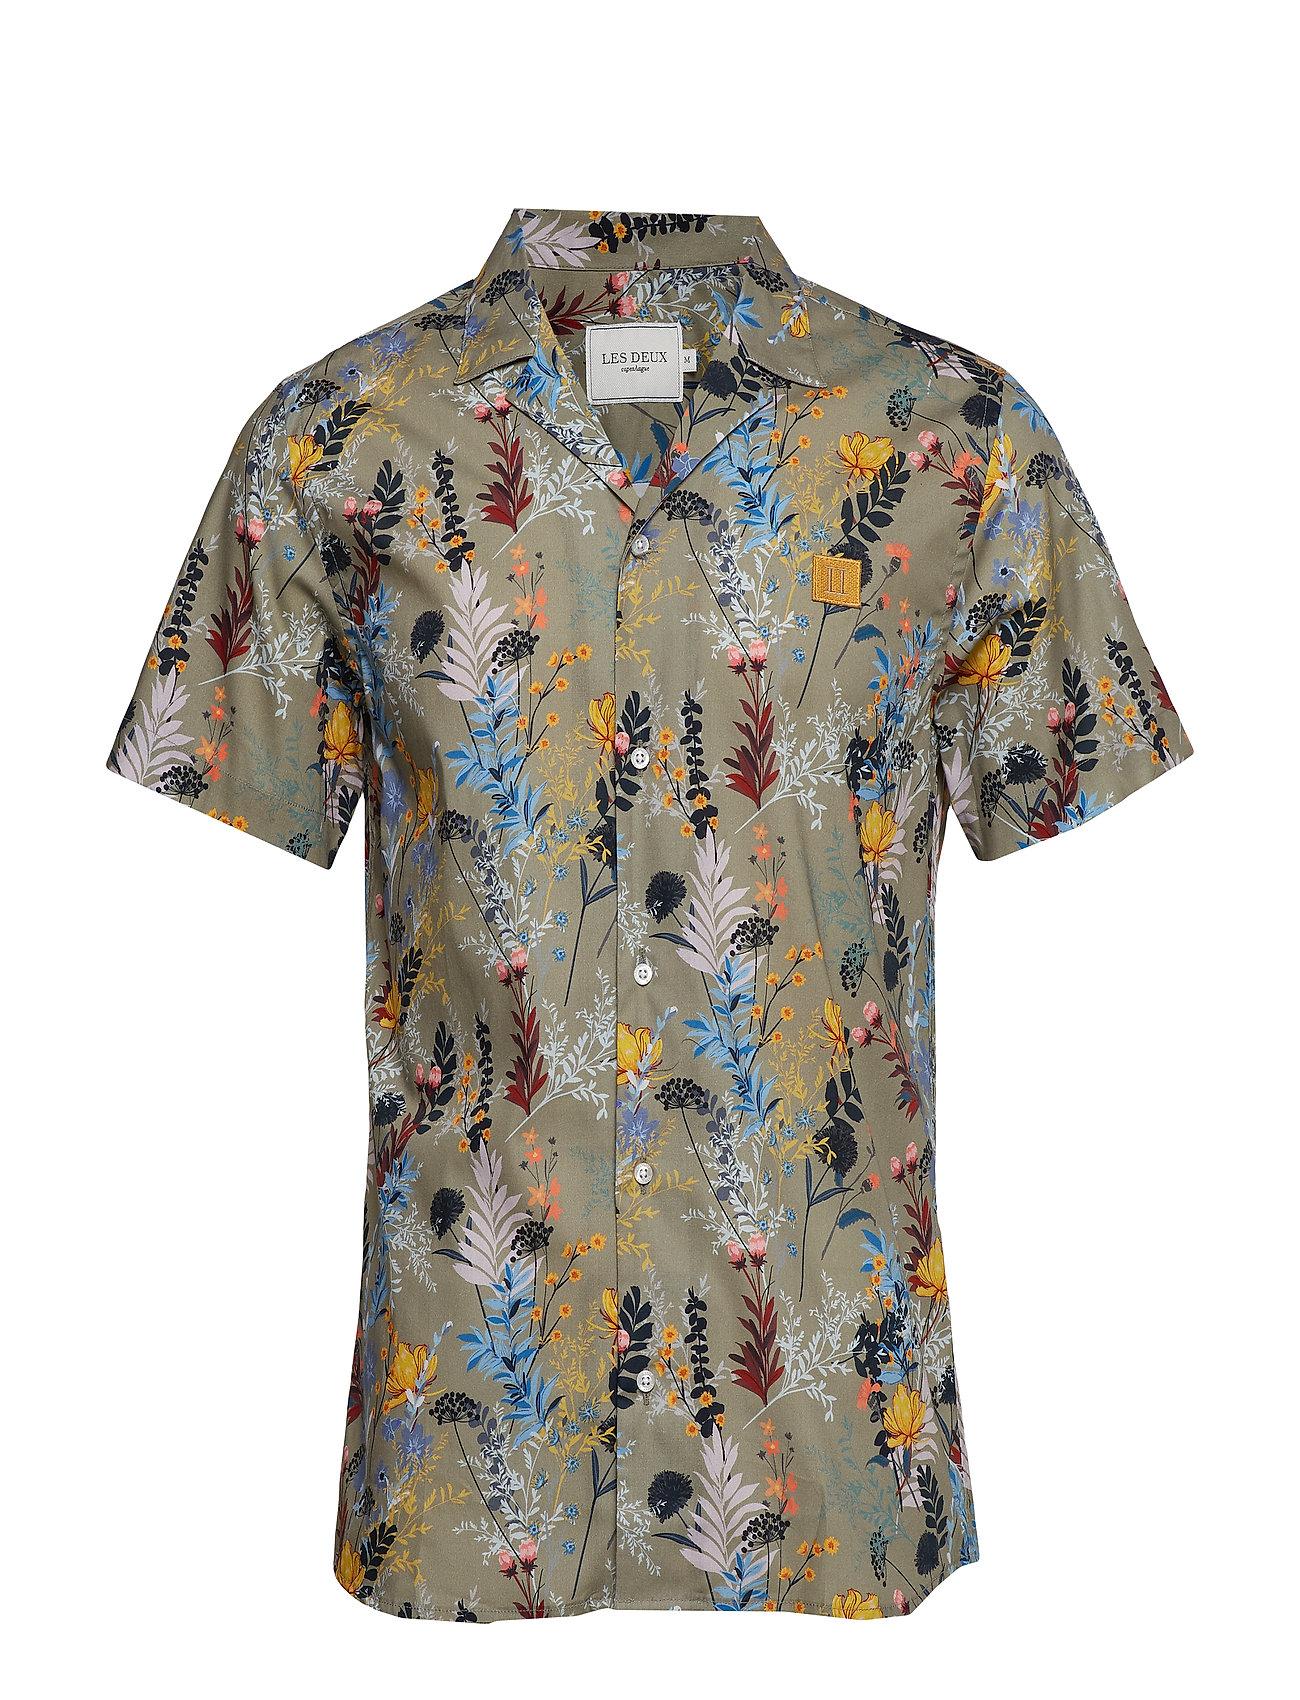 Les Deux Boozt SS Shirt - TEA GREEN